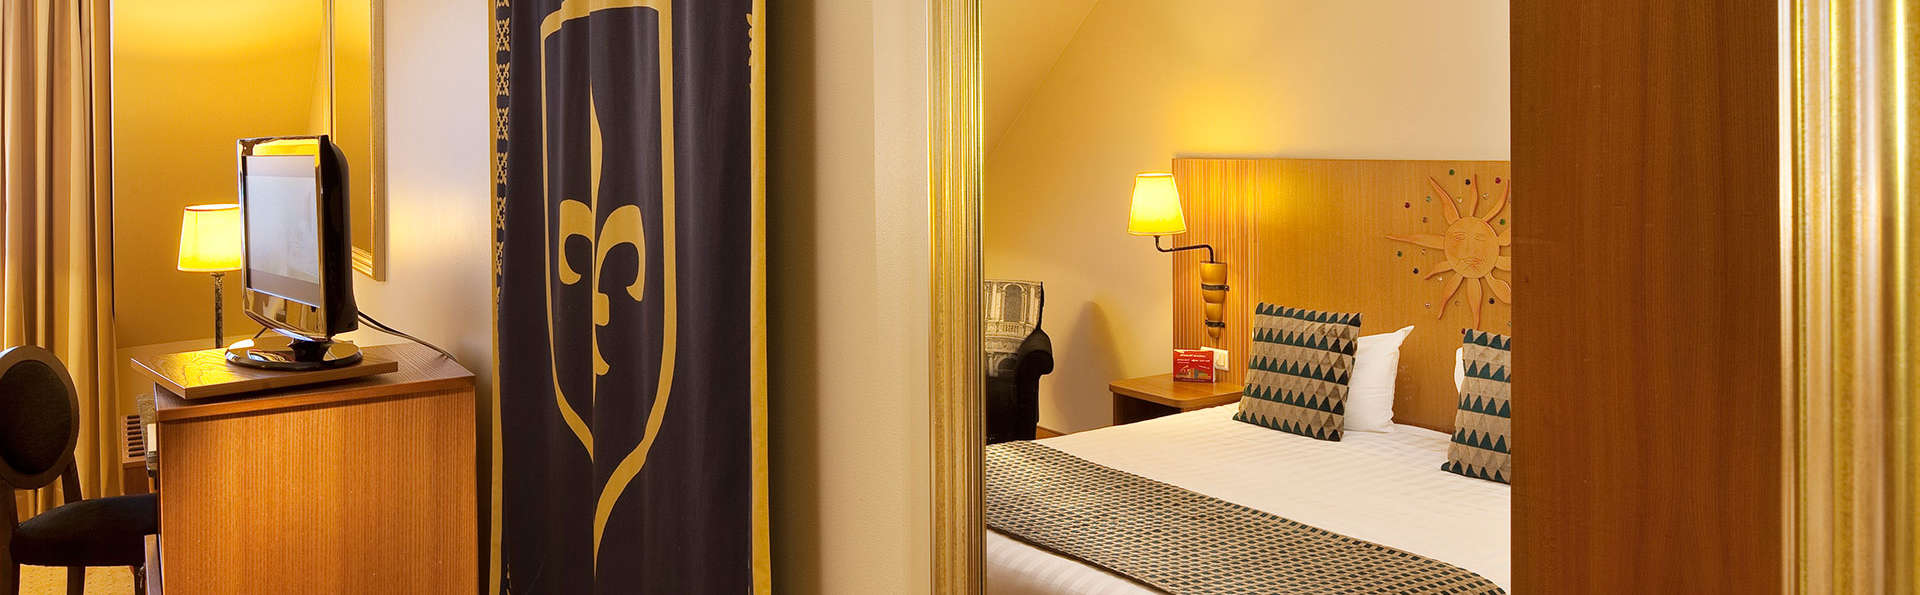 Vienna House Dream Castle Hotel Paris - edit_king_room.jpg